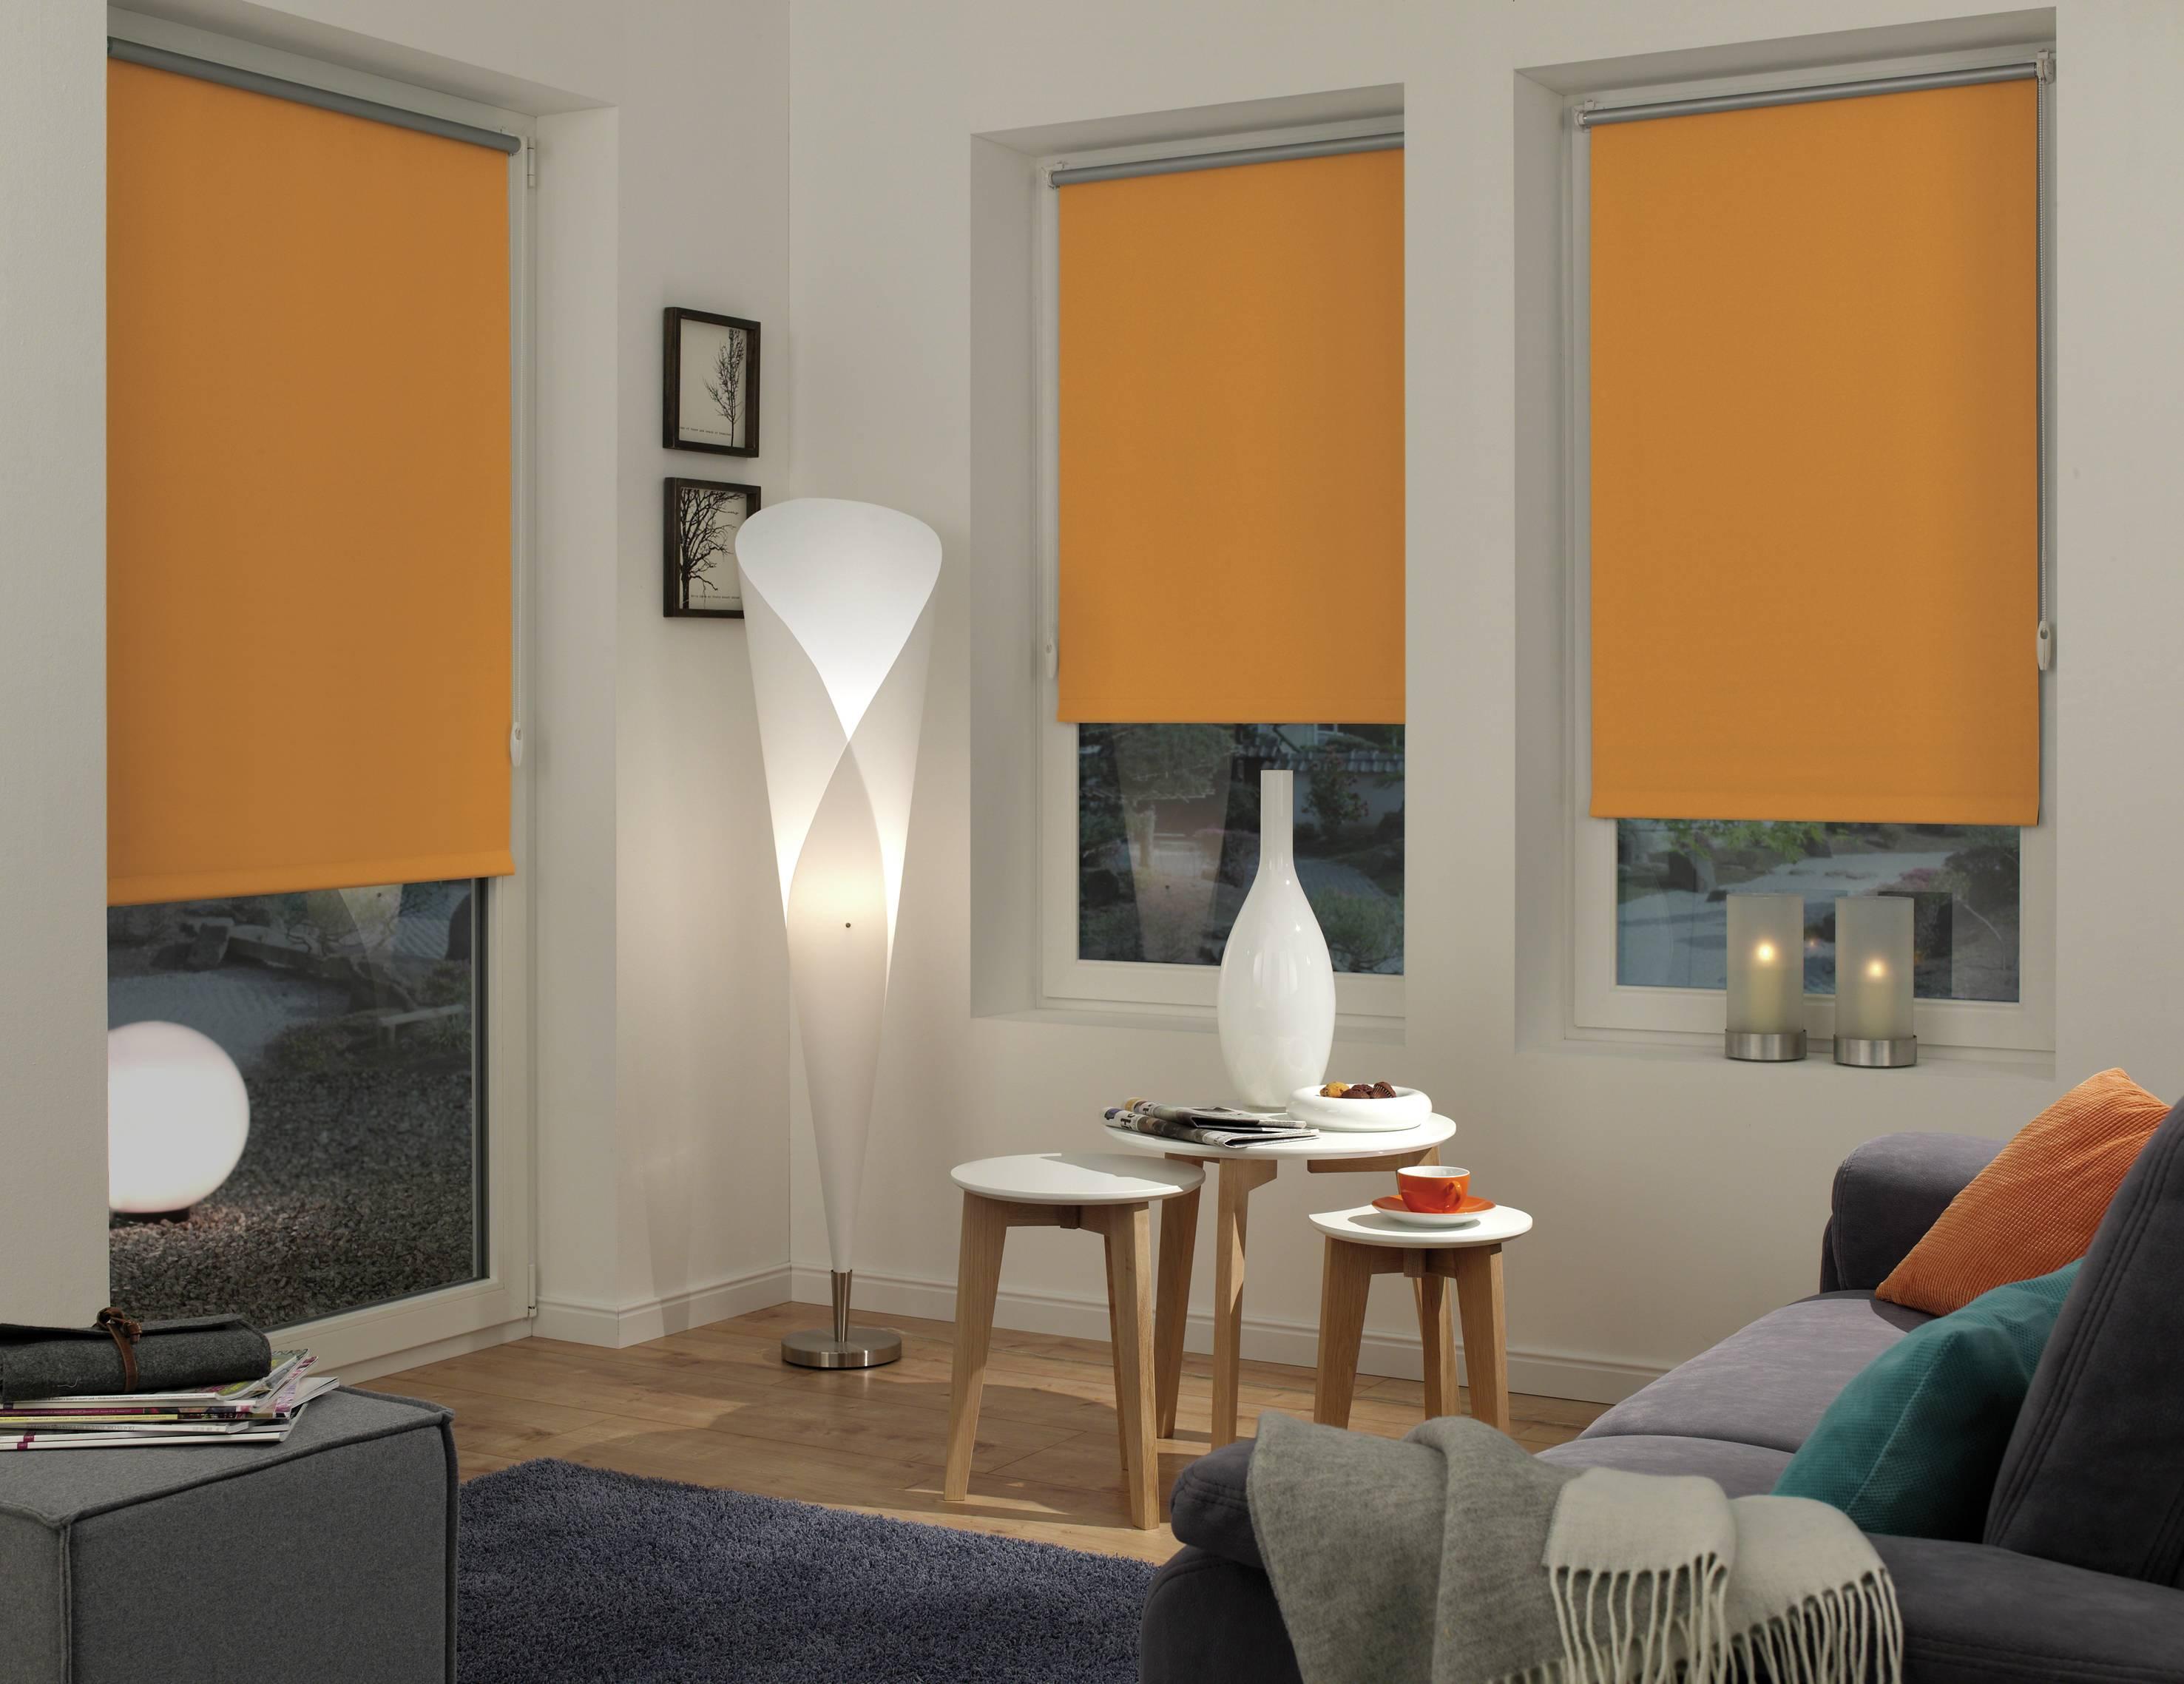 easyfix rollo thermo orange 100 x 150 cm 12555. Black Bedroom Furniture Sets. Home Design Ideas